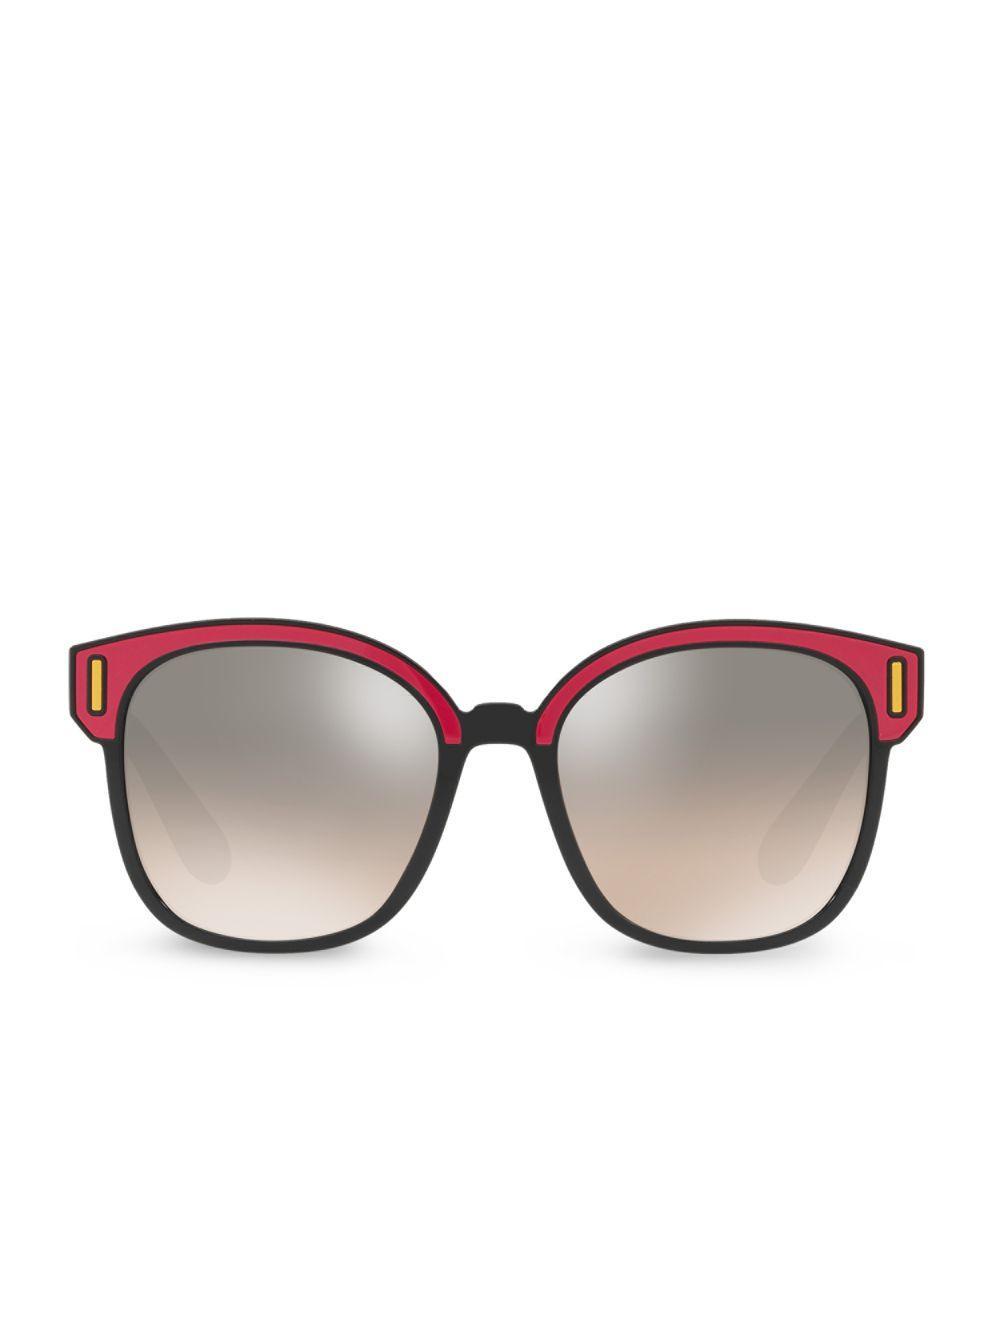 99dba76638 Lyst - Prada Color Pop Mirrored Lens Sunglasses